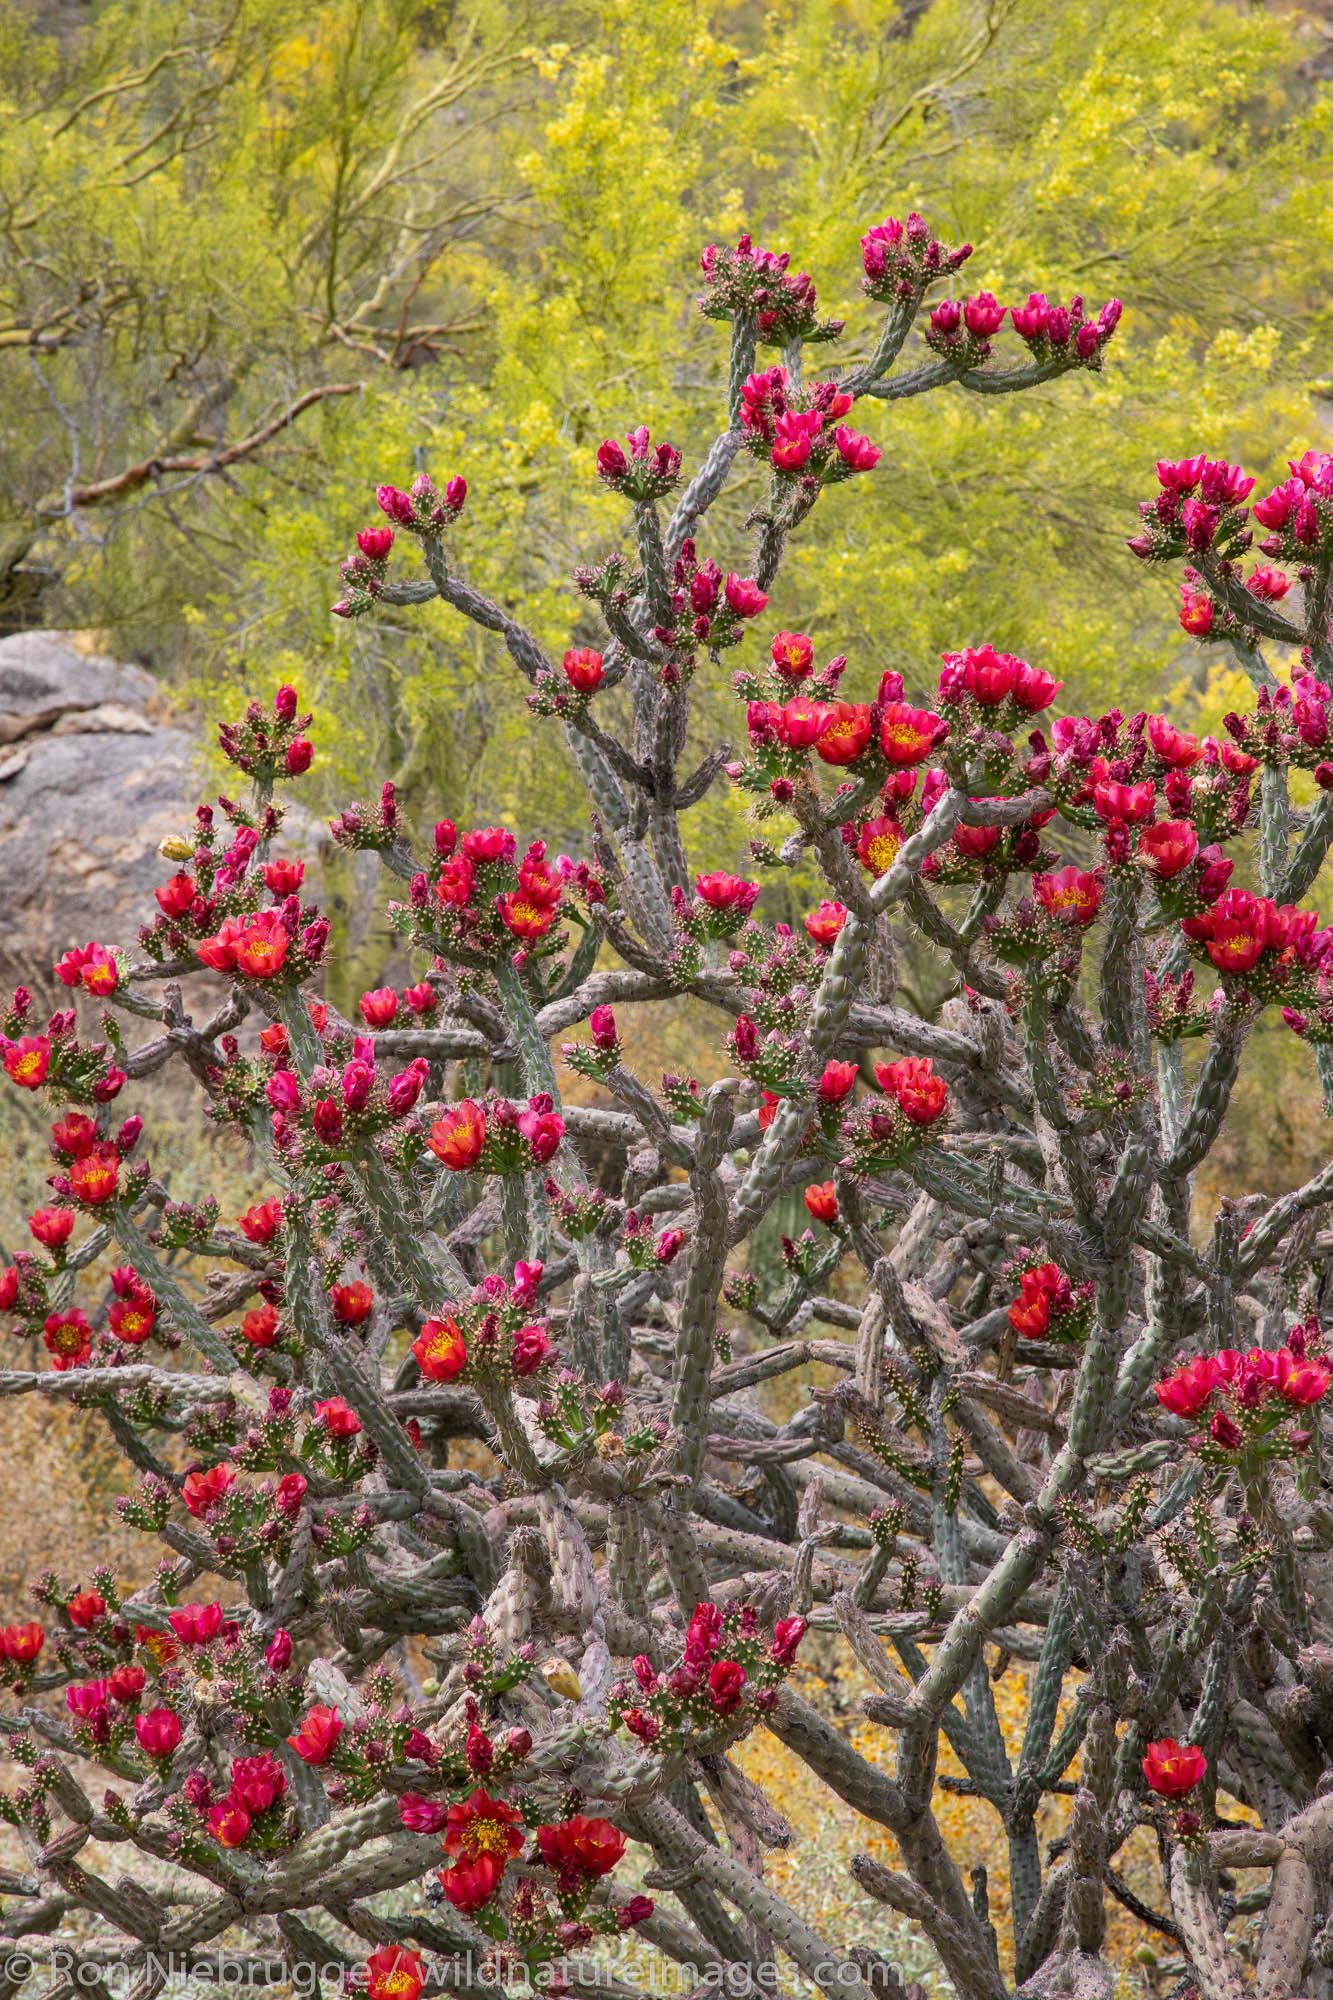 Cholla cactus flowers, Tortolita Mountains, Marana, near Tucson, Arizona.